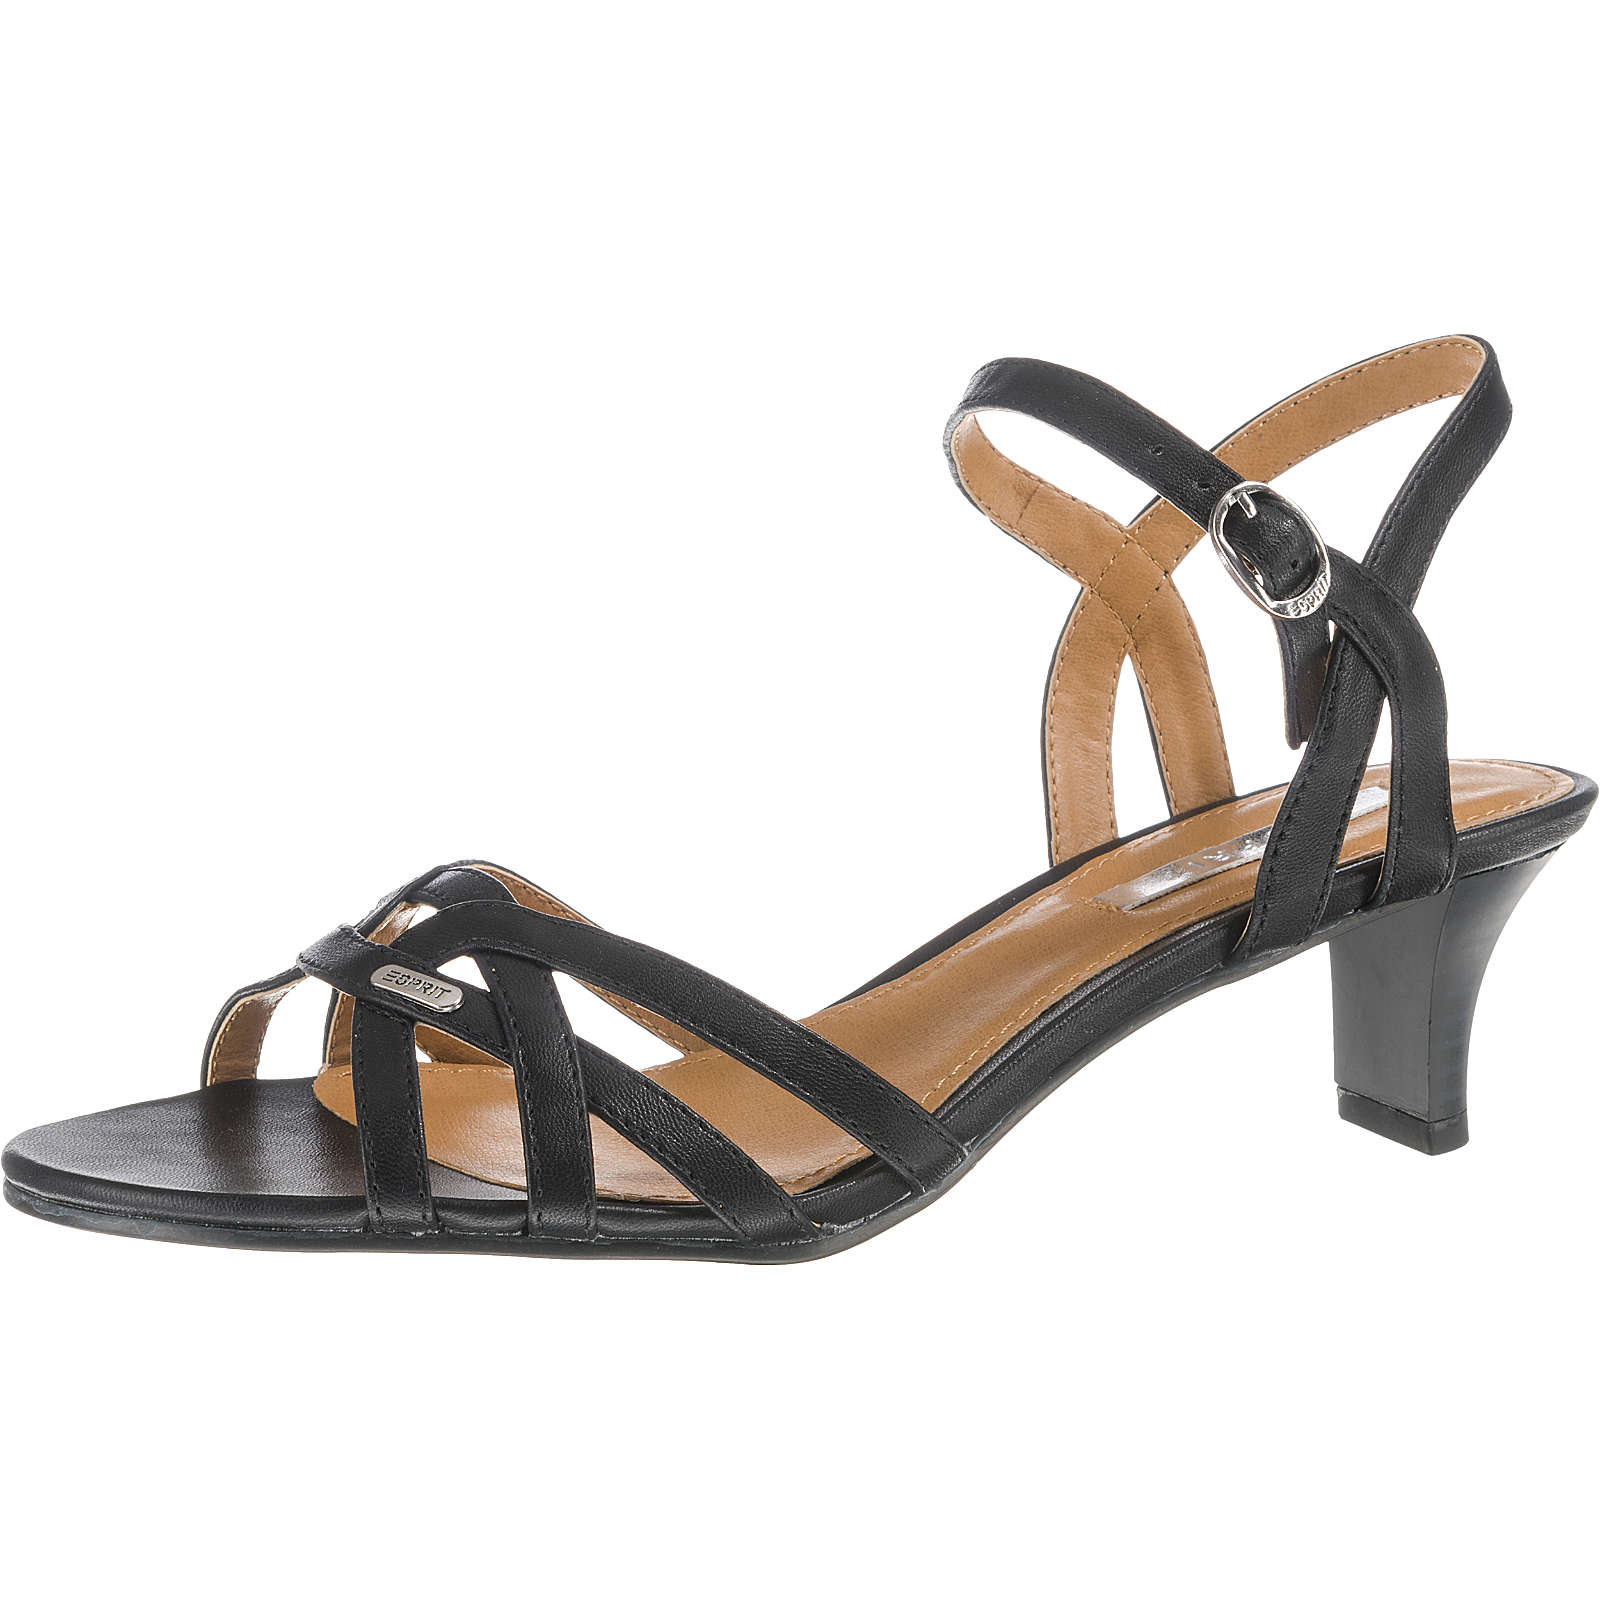 ESPRIT Birkin Sandal Klassische Sandaletten schwarz Damen Gr. 36